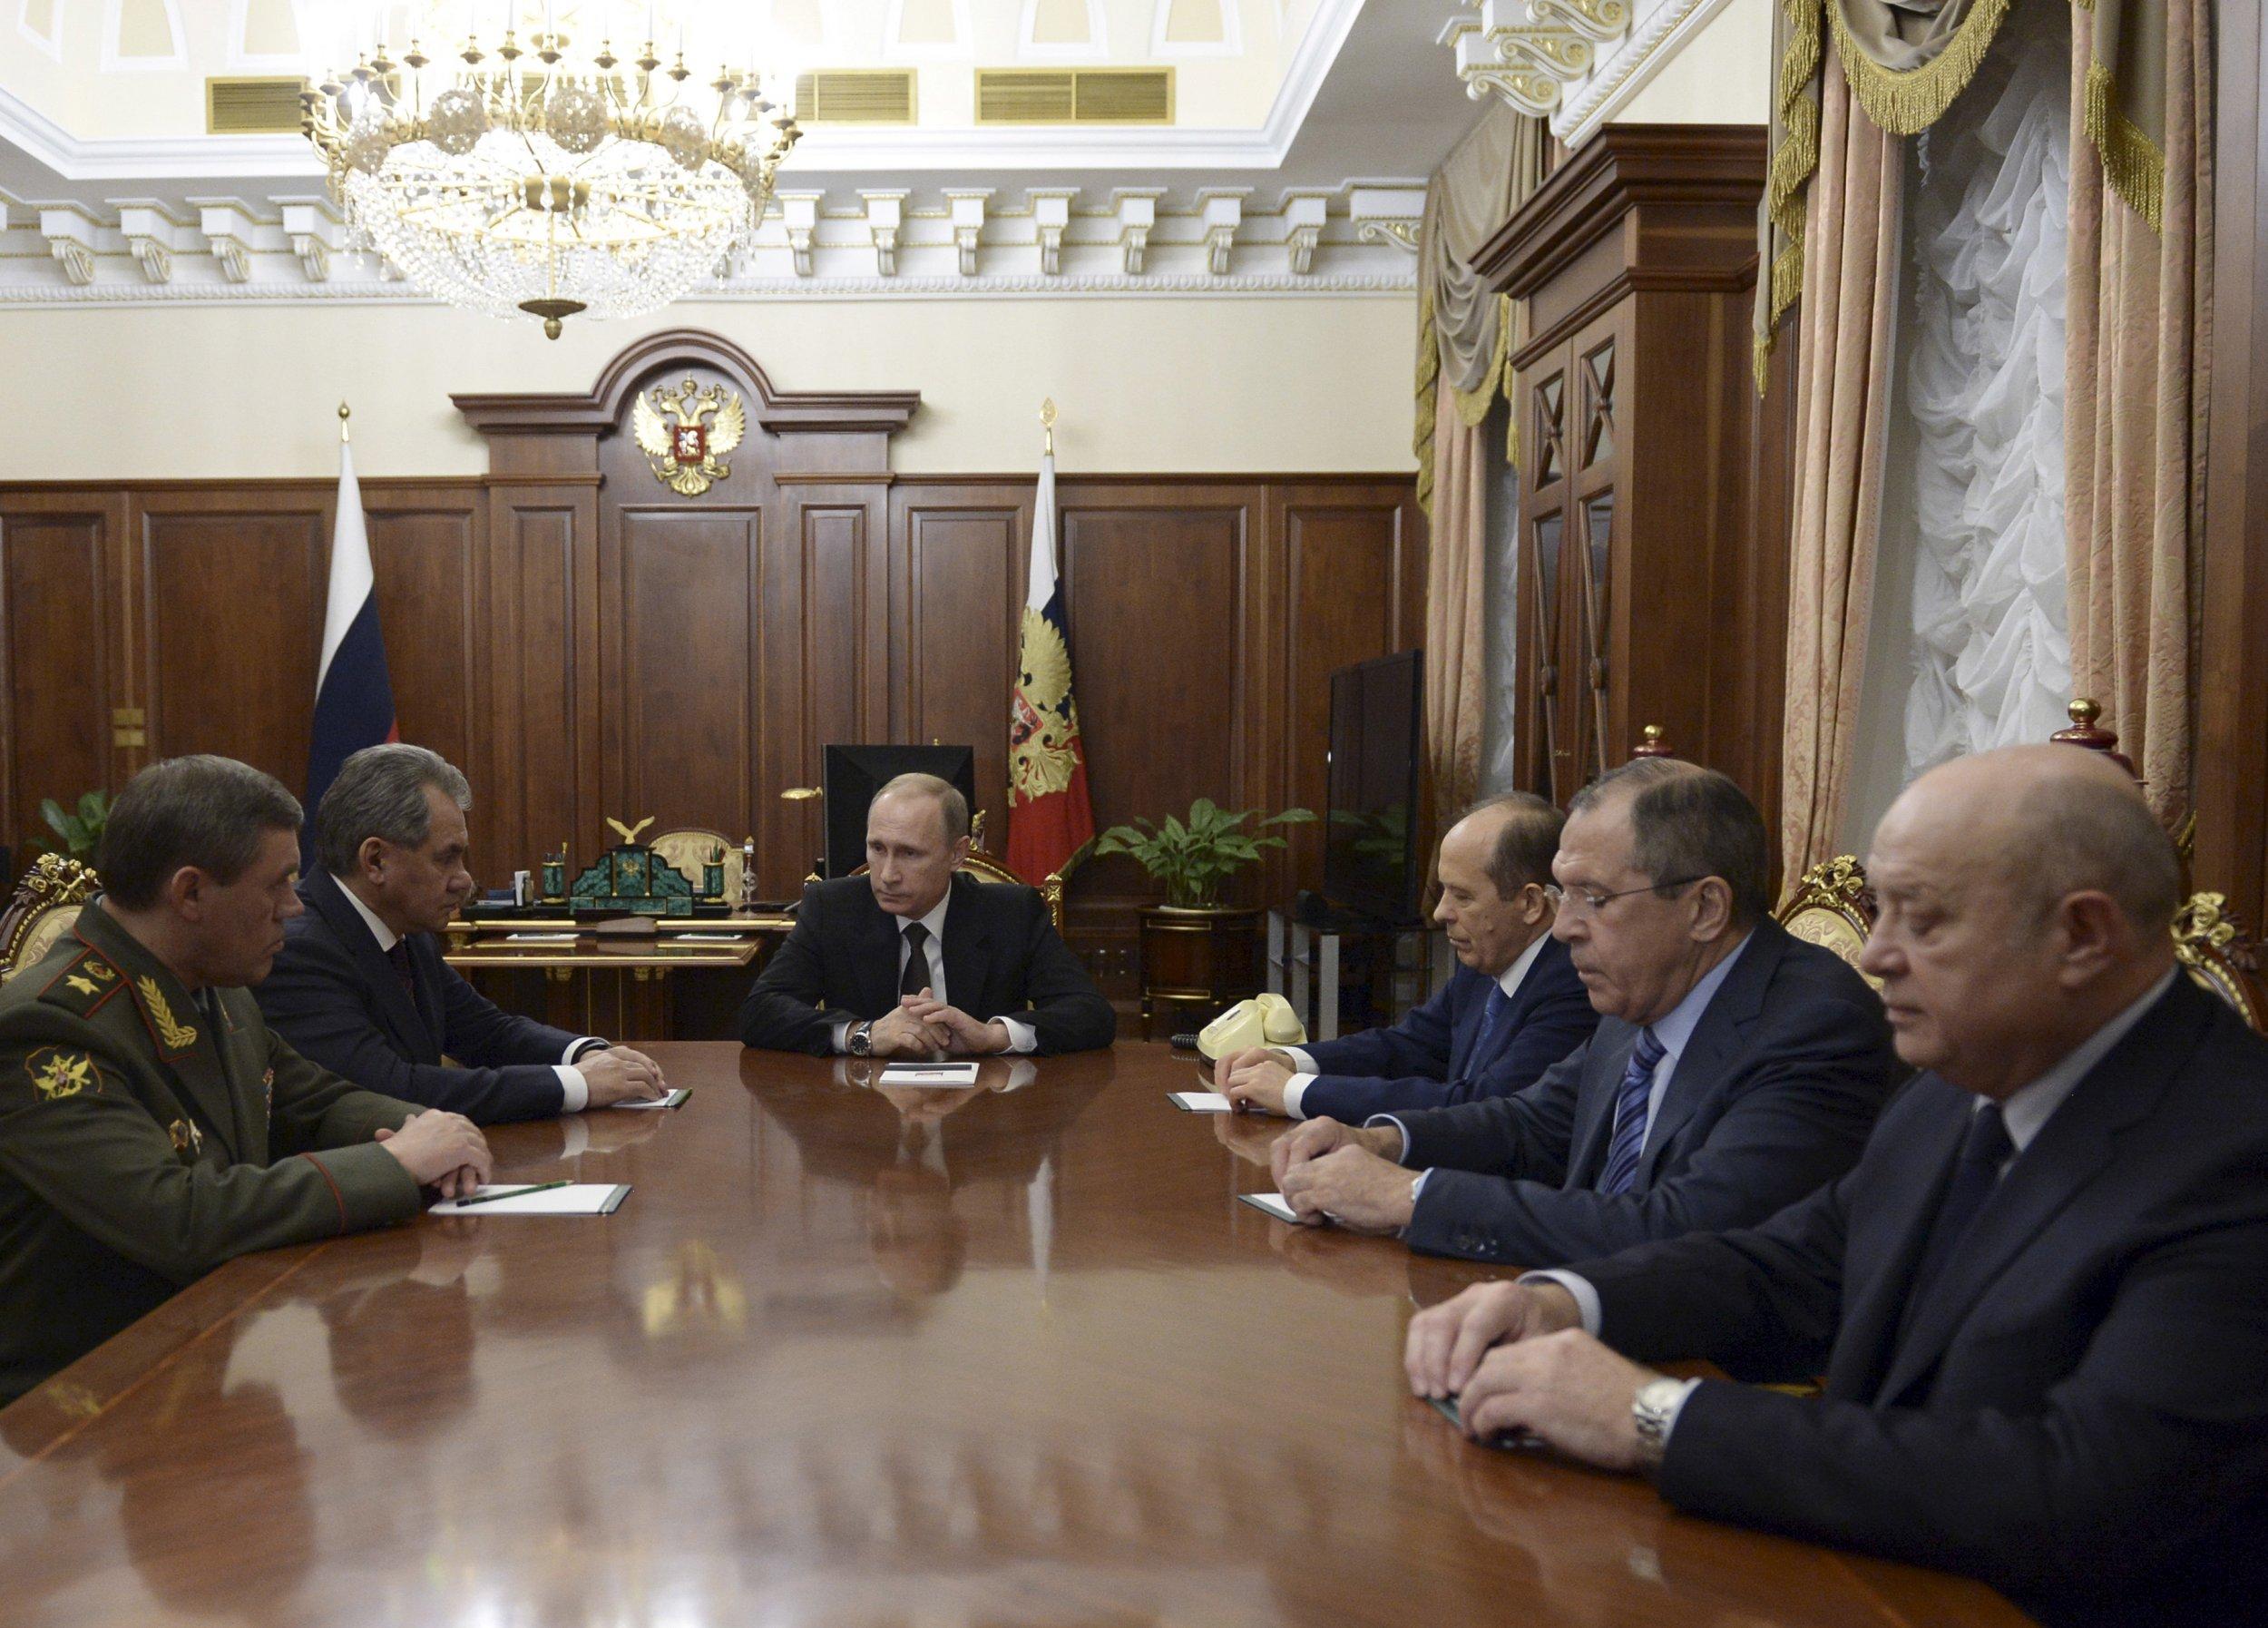 03_22_Putin_Retreat_01